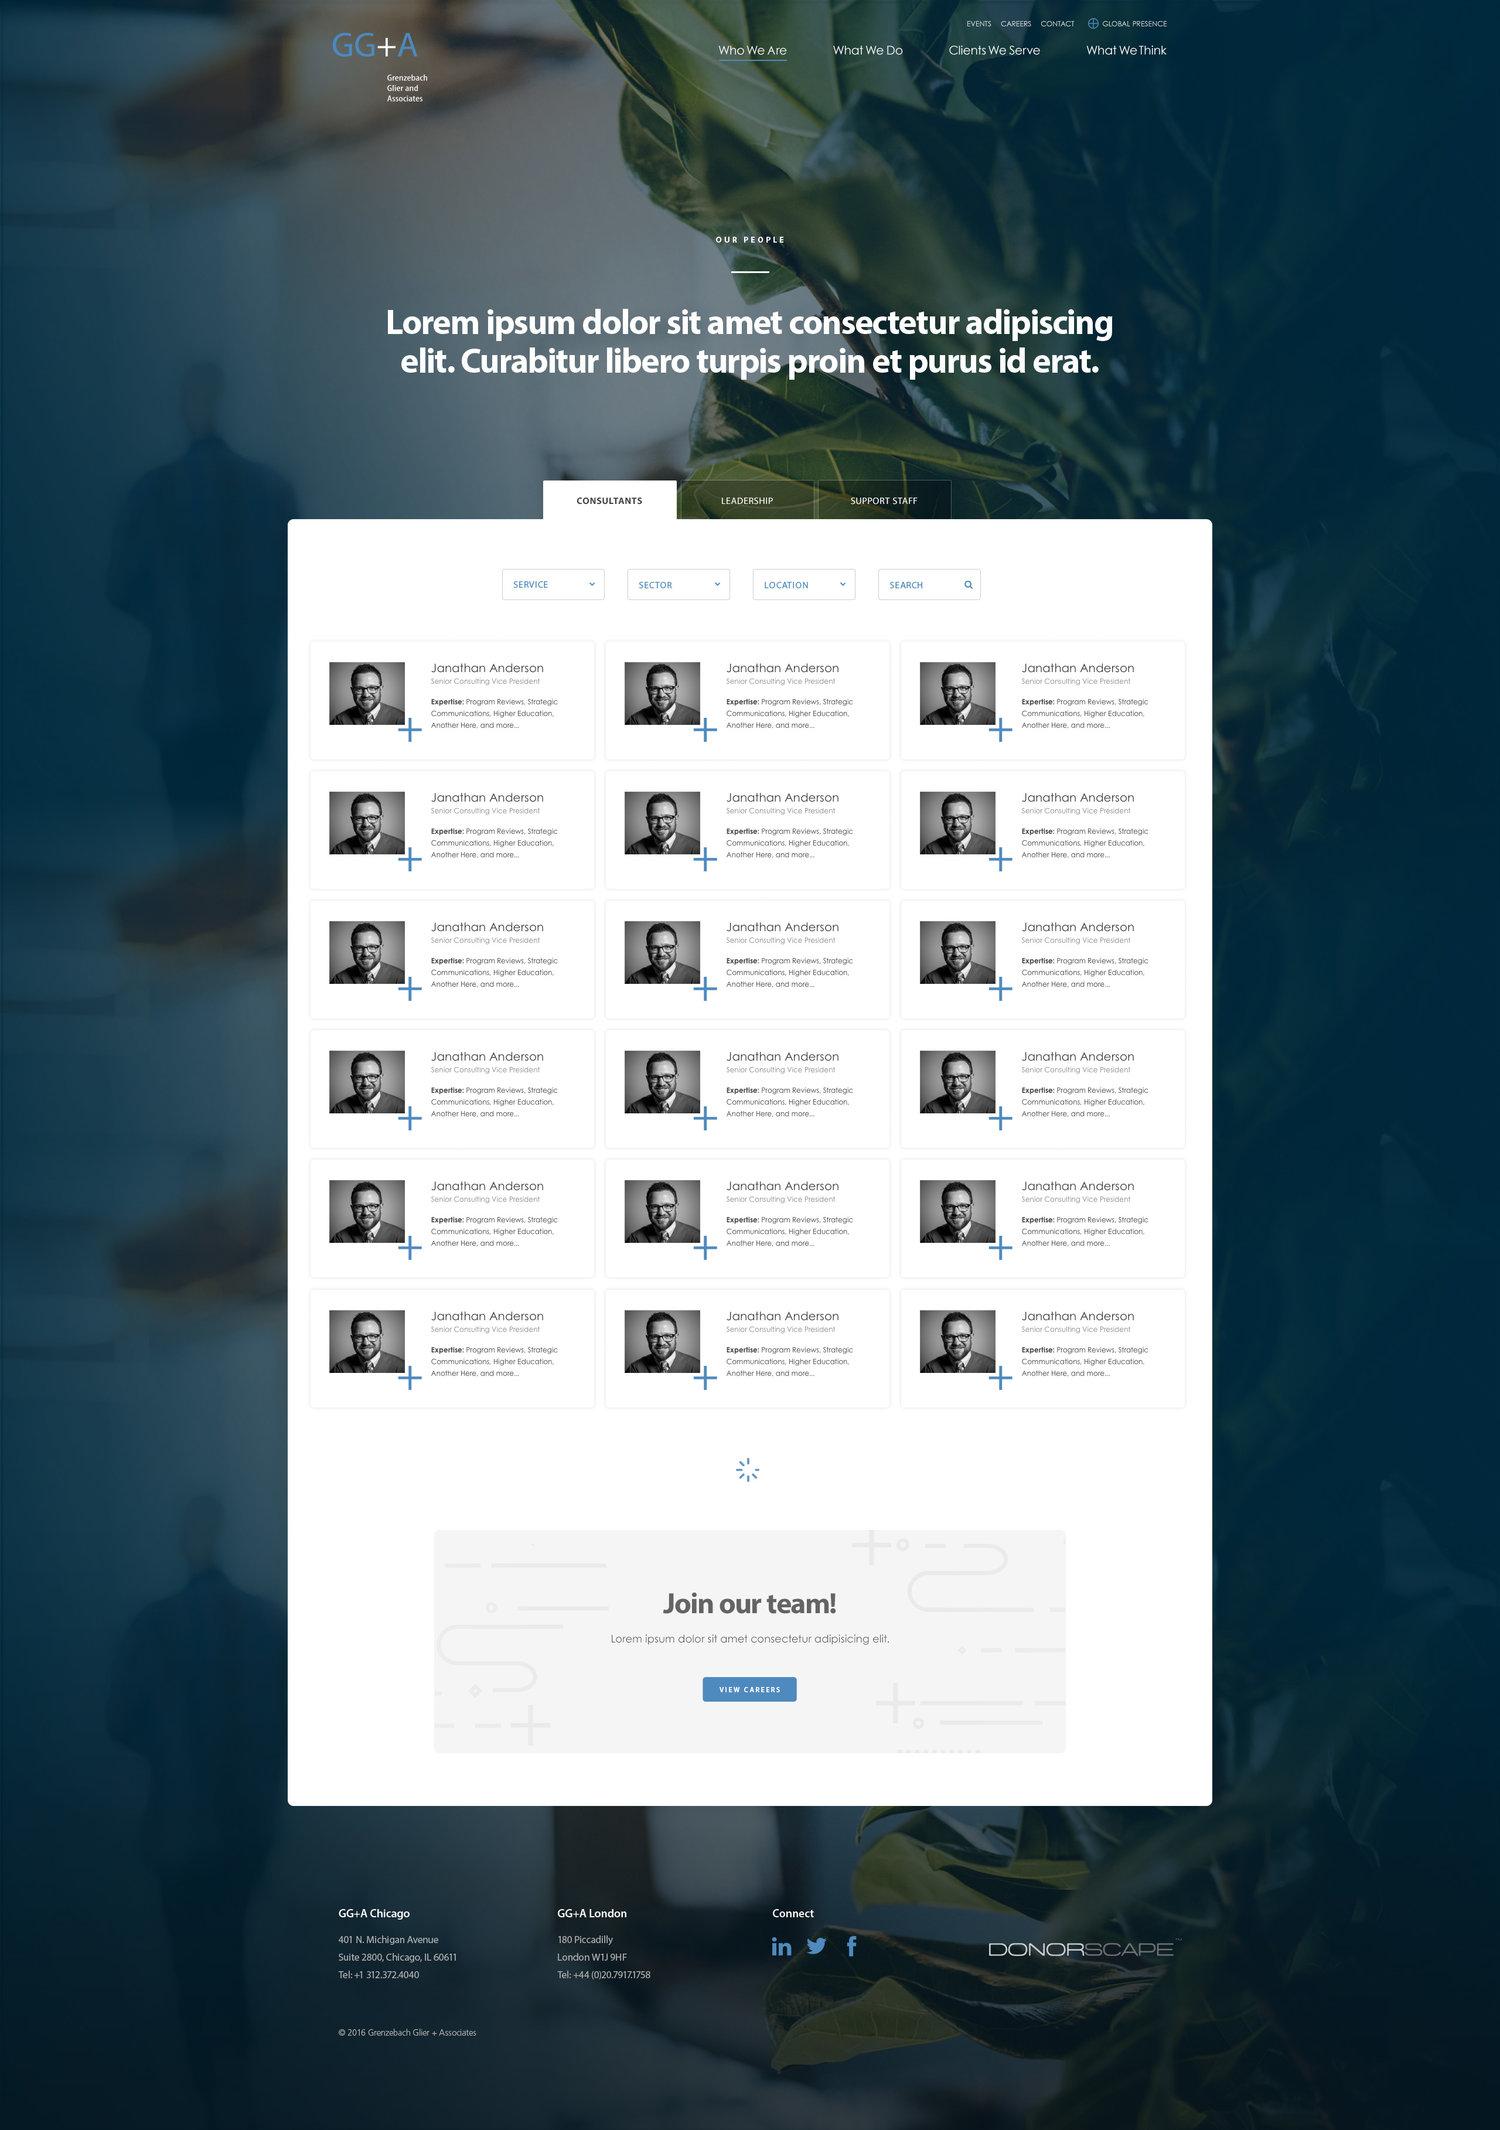 Web Design | GG+A - People (Desktop View)